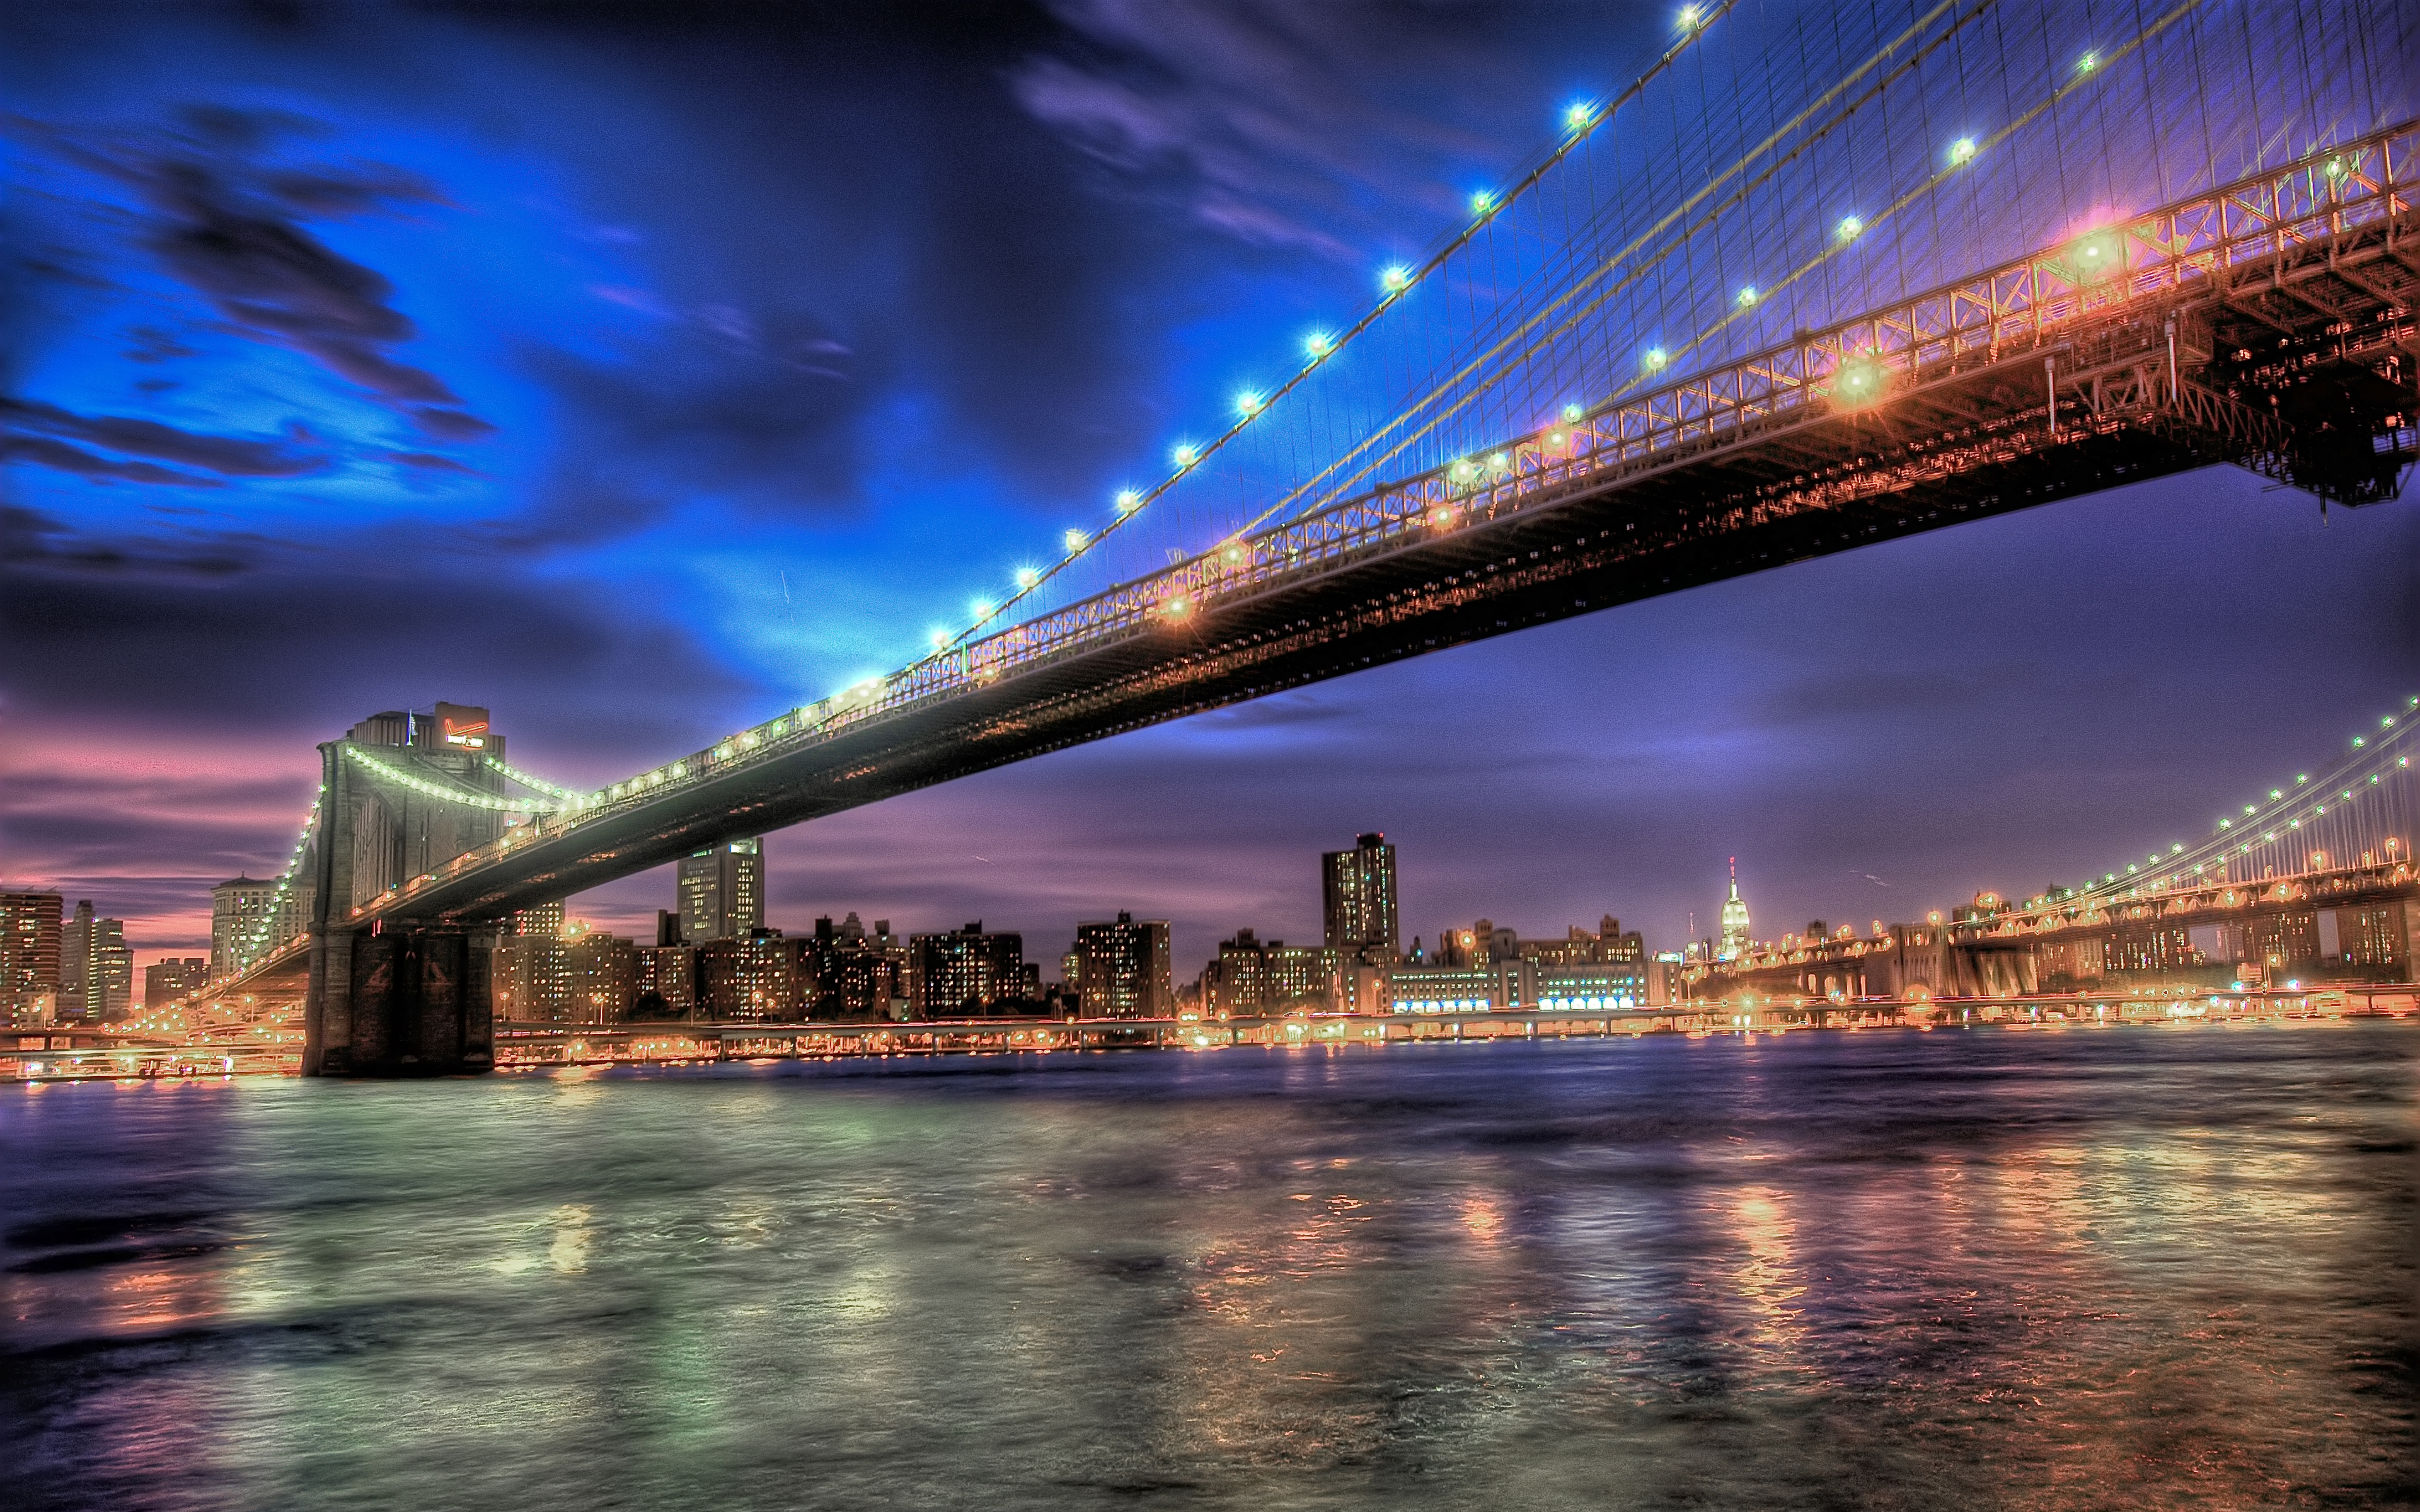 Brooklyn bridge 4k ultra hd wallpaper background image - Bridge wallpaper hd ...